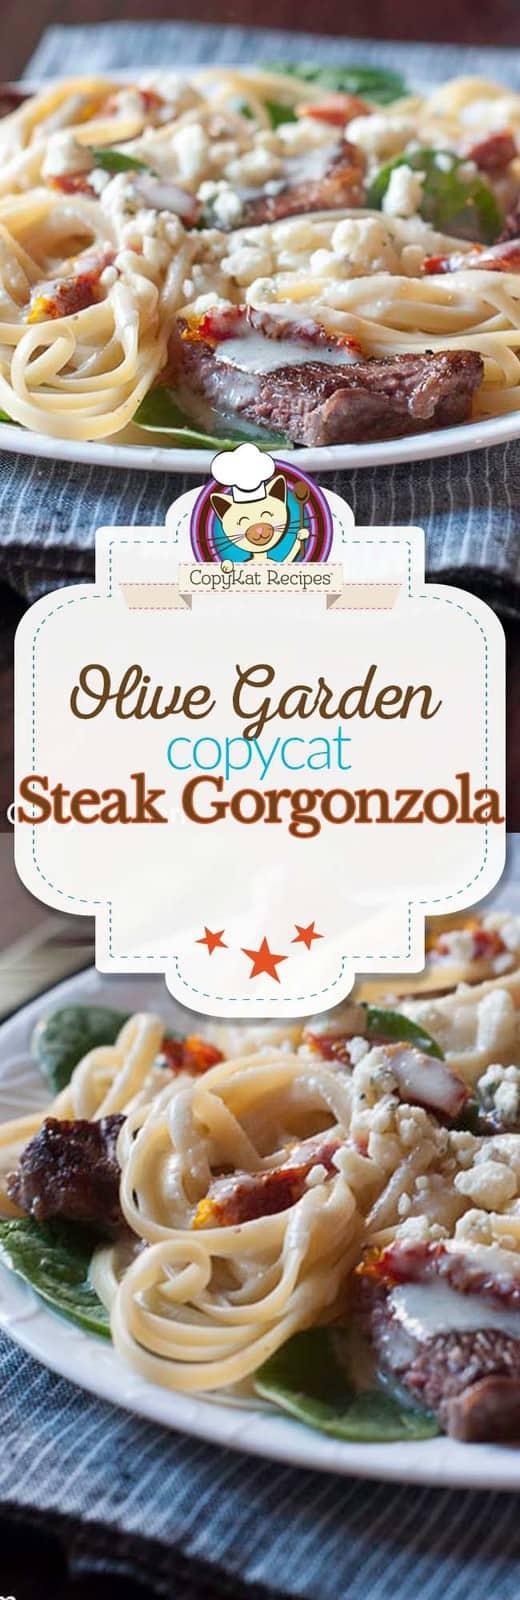 Olive garden steak gorgonzola alfredo copycat recipe - Olive garden alfredo sauce recipe copycat ...